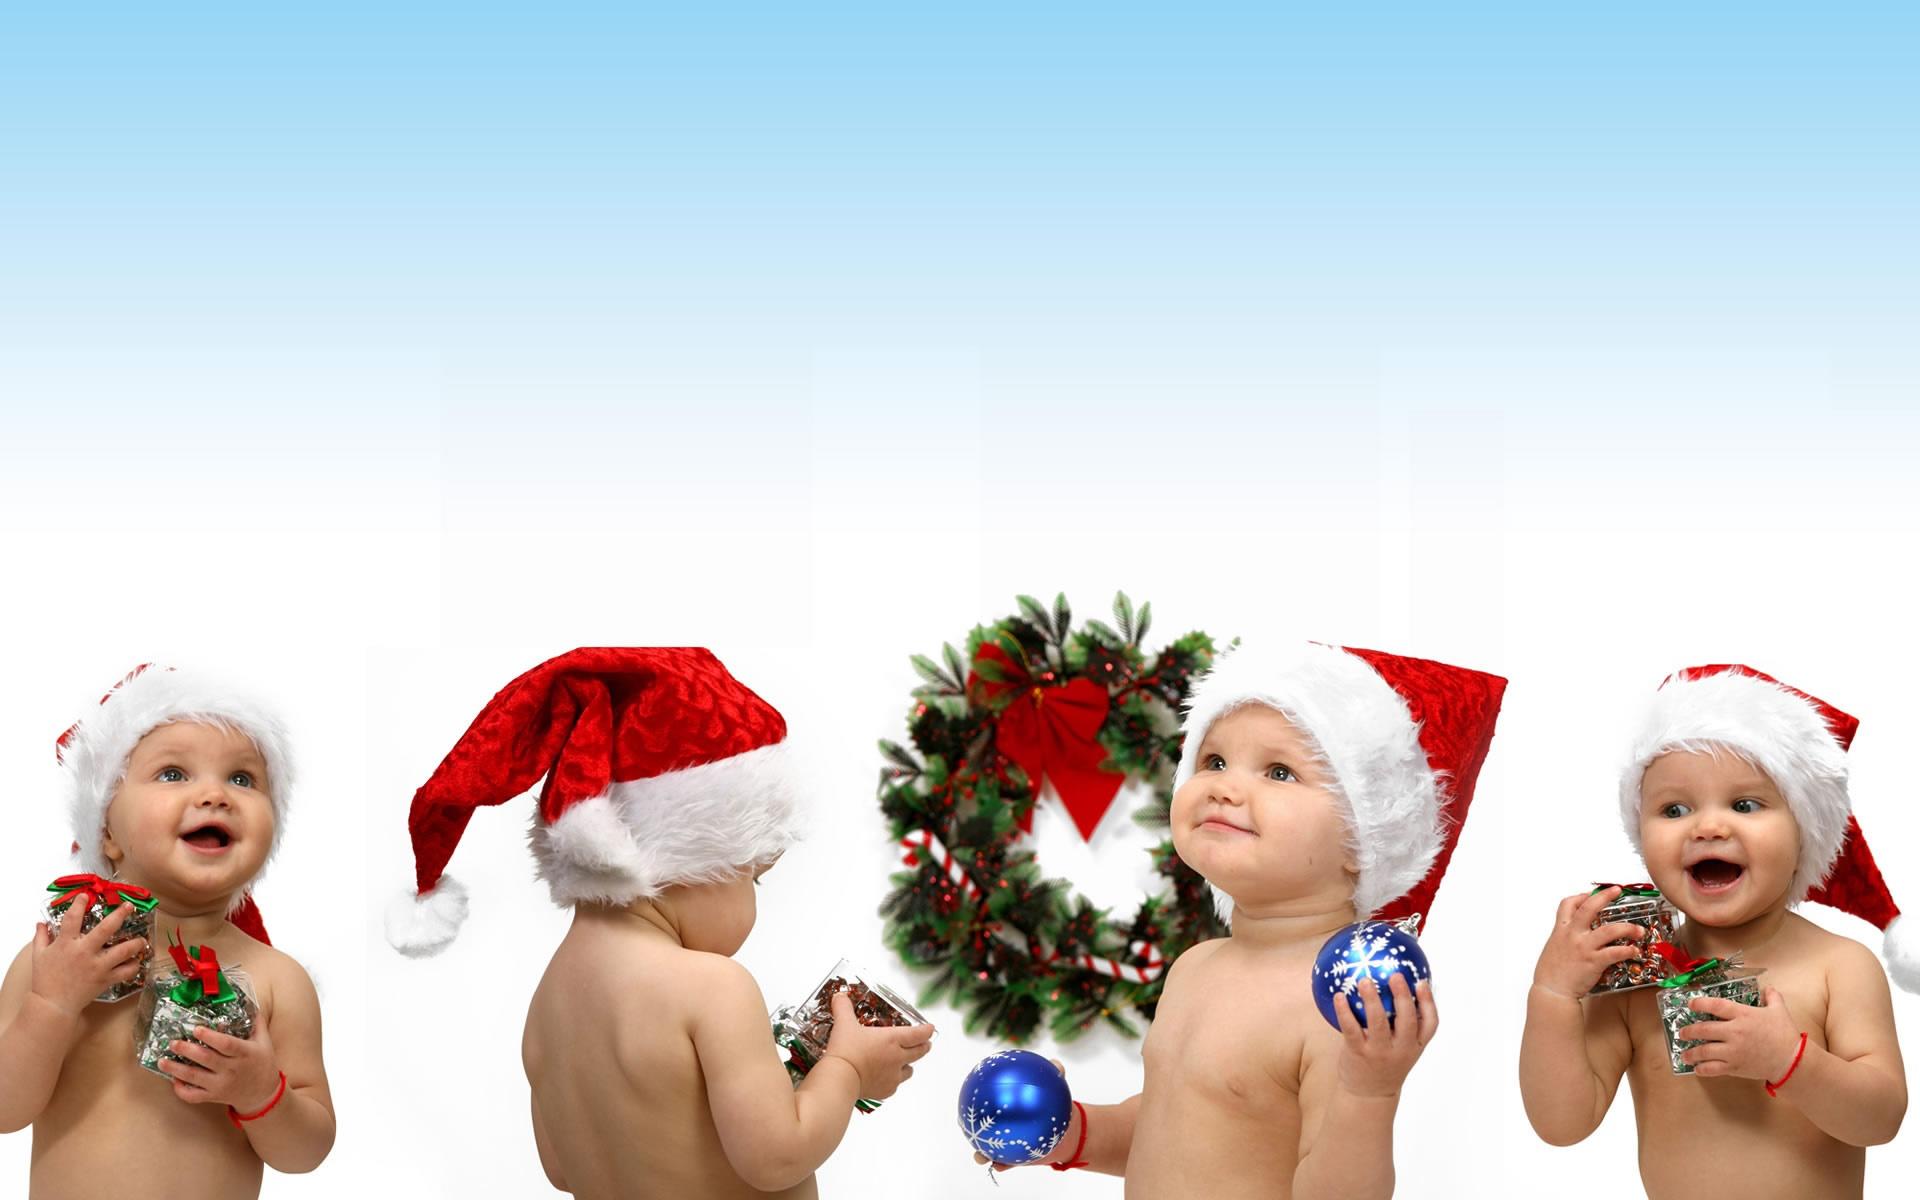 1920x1200 Christmas children desktop PC and Mac wallpaper 1920x1200